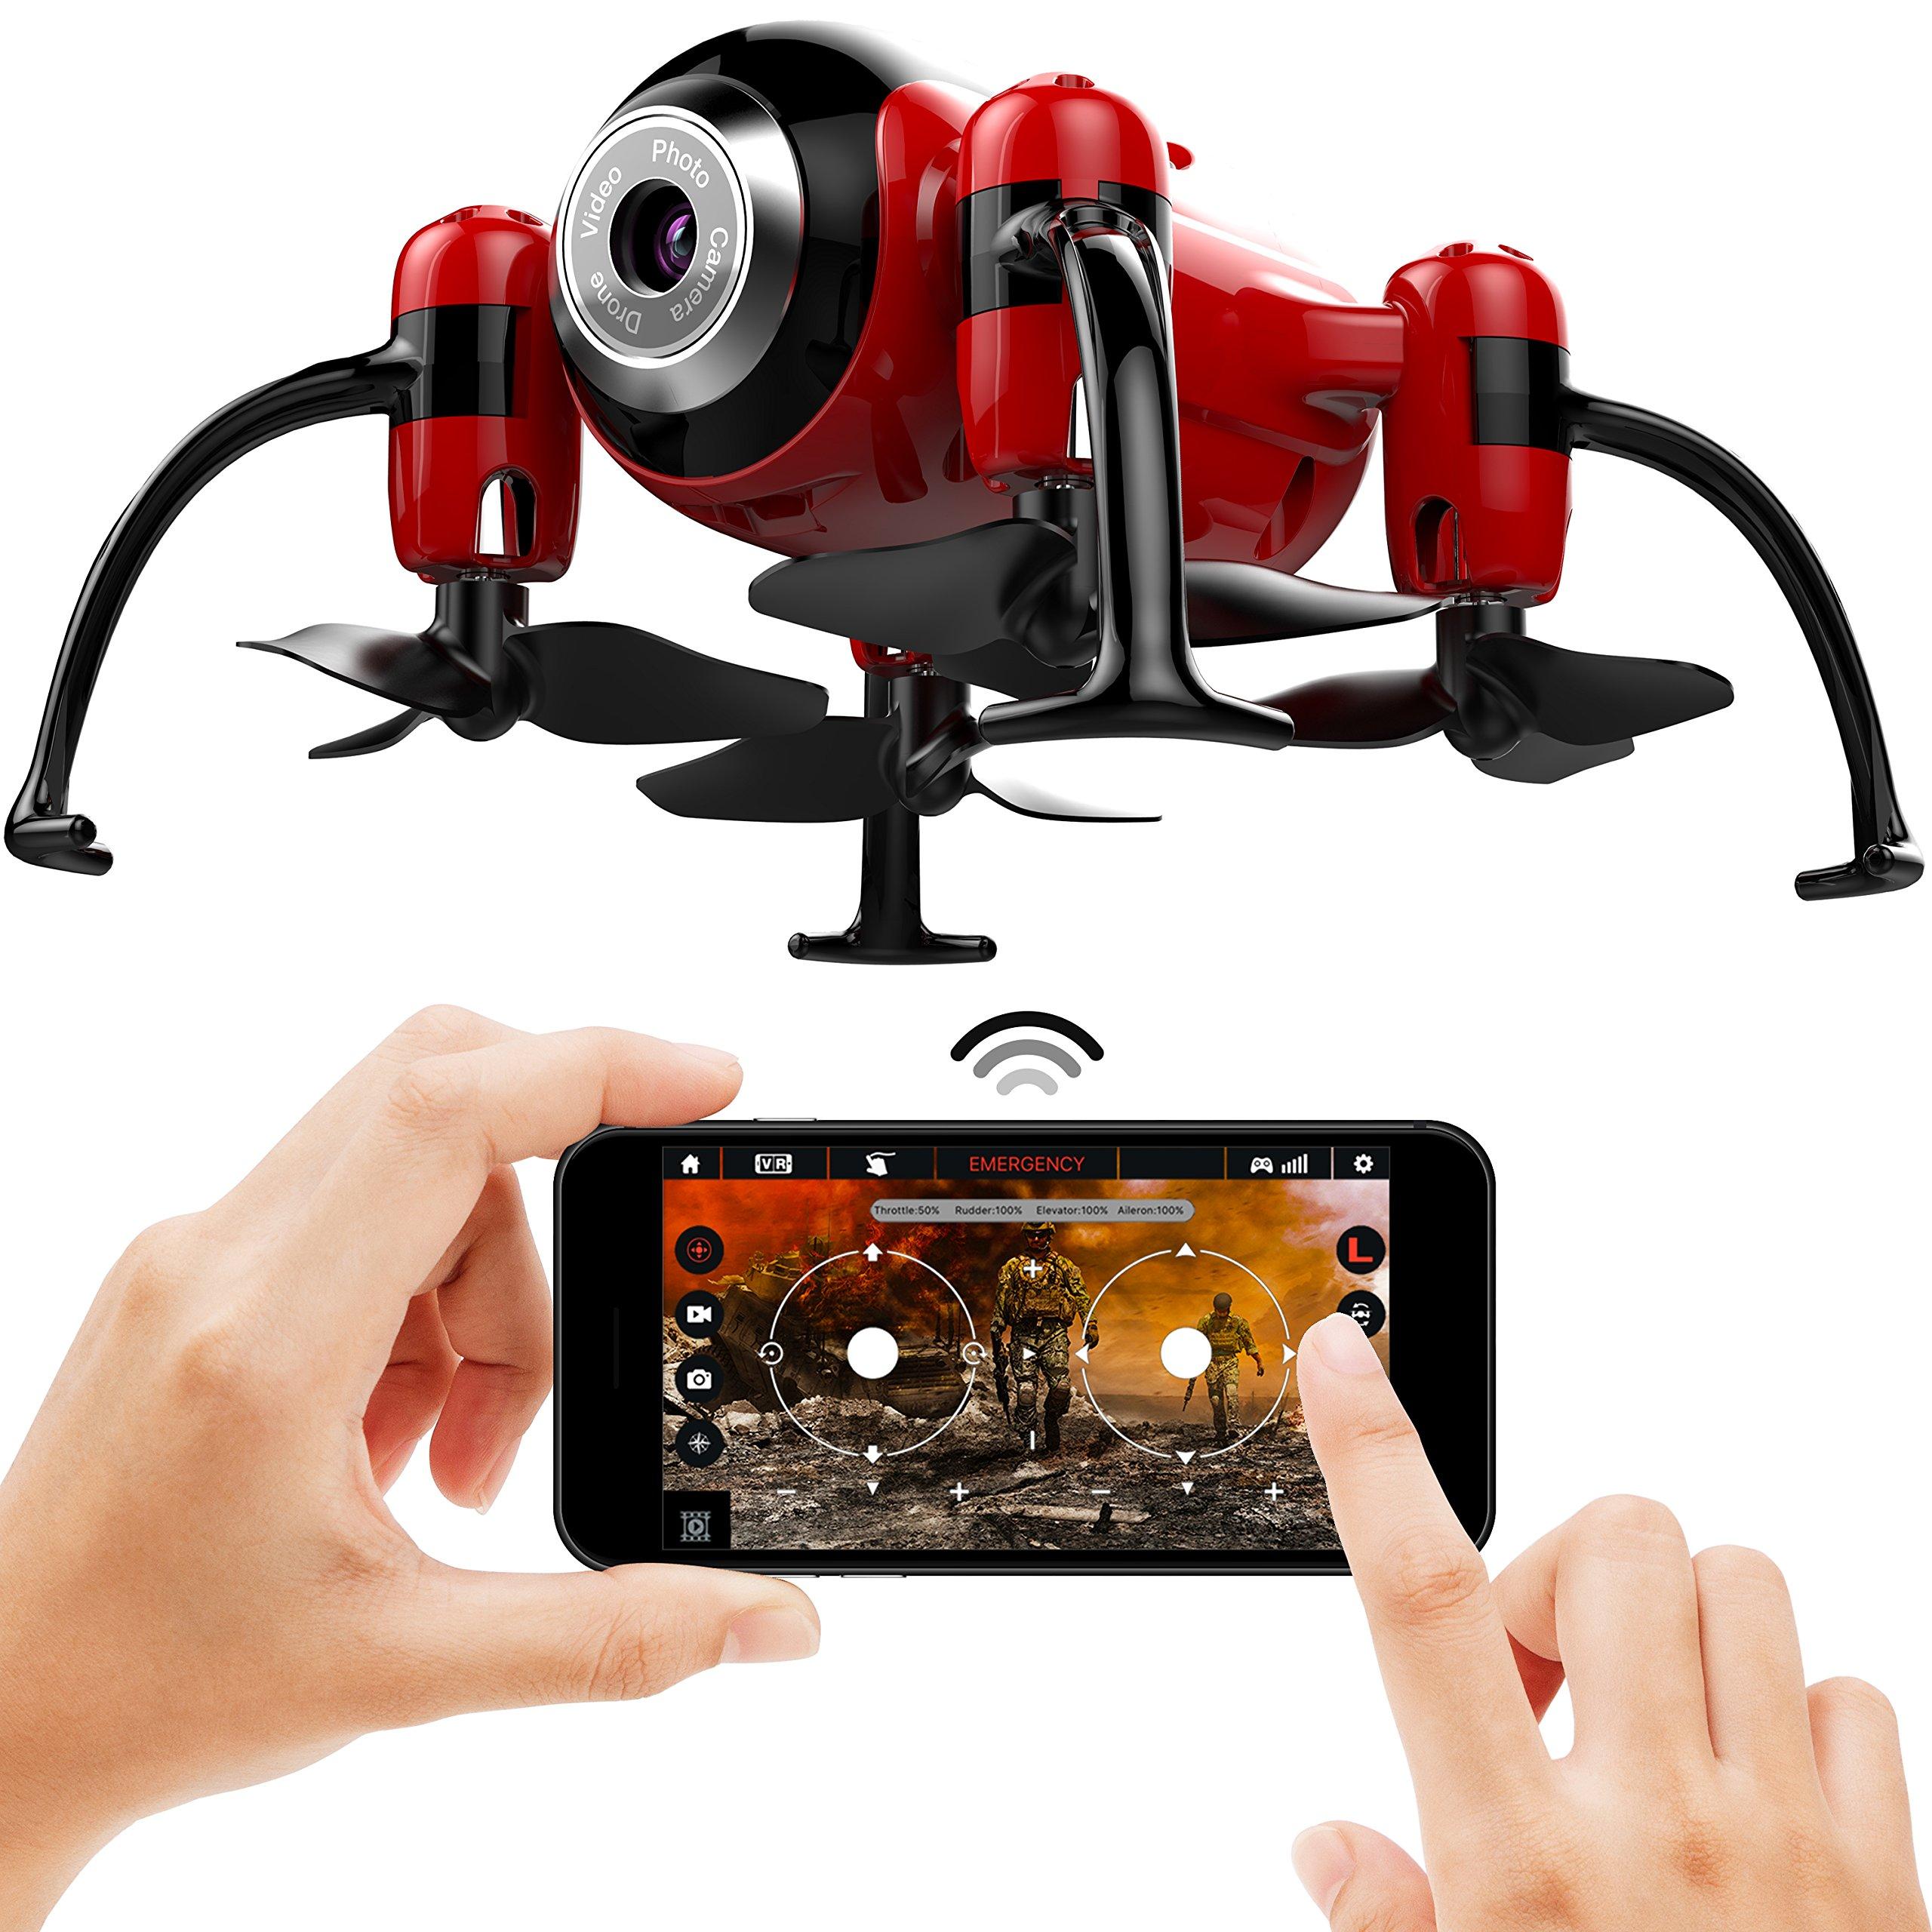 Kolibri Torpedo Mini Drone for kids Micro Camera with FPV App Video Stream, Altitude Hold, Headless Mode, One-Button Auto Take-Off & Landing, Nano Quadcopter for Beginners Model: XK2380